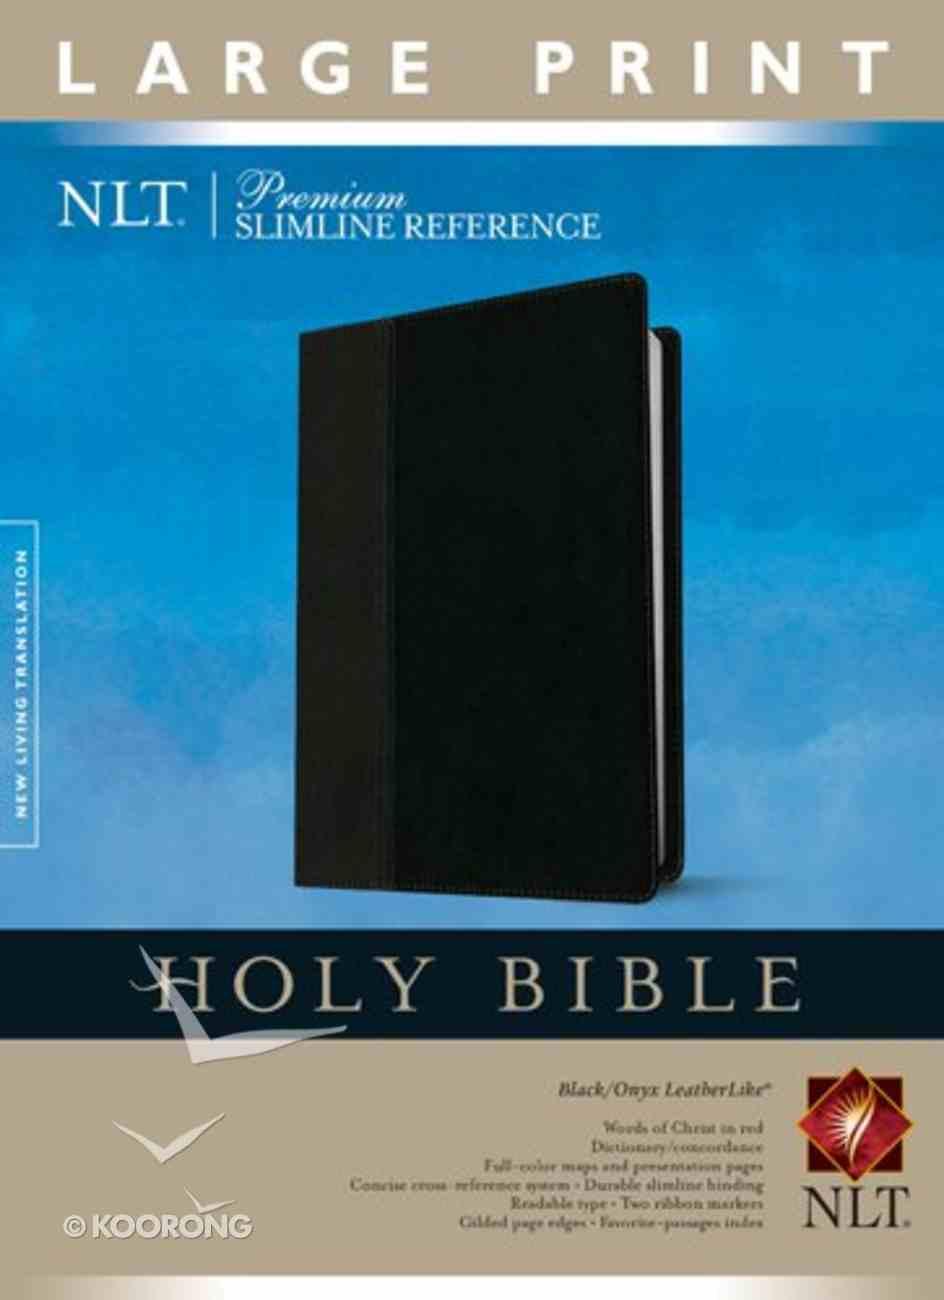 NLT Premium Slimline Reference Large Print Black/Onyx (Red Letter Edition) Imitation Leather